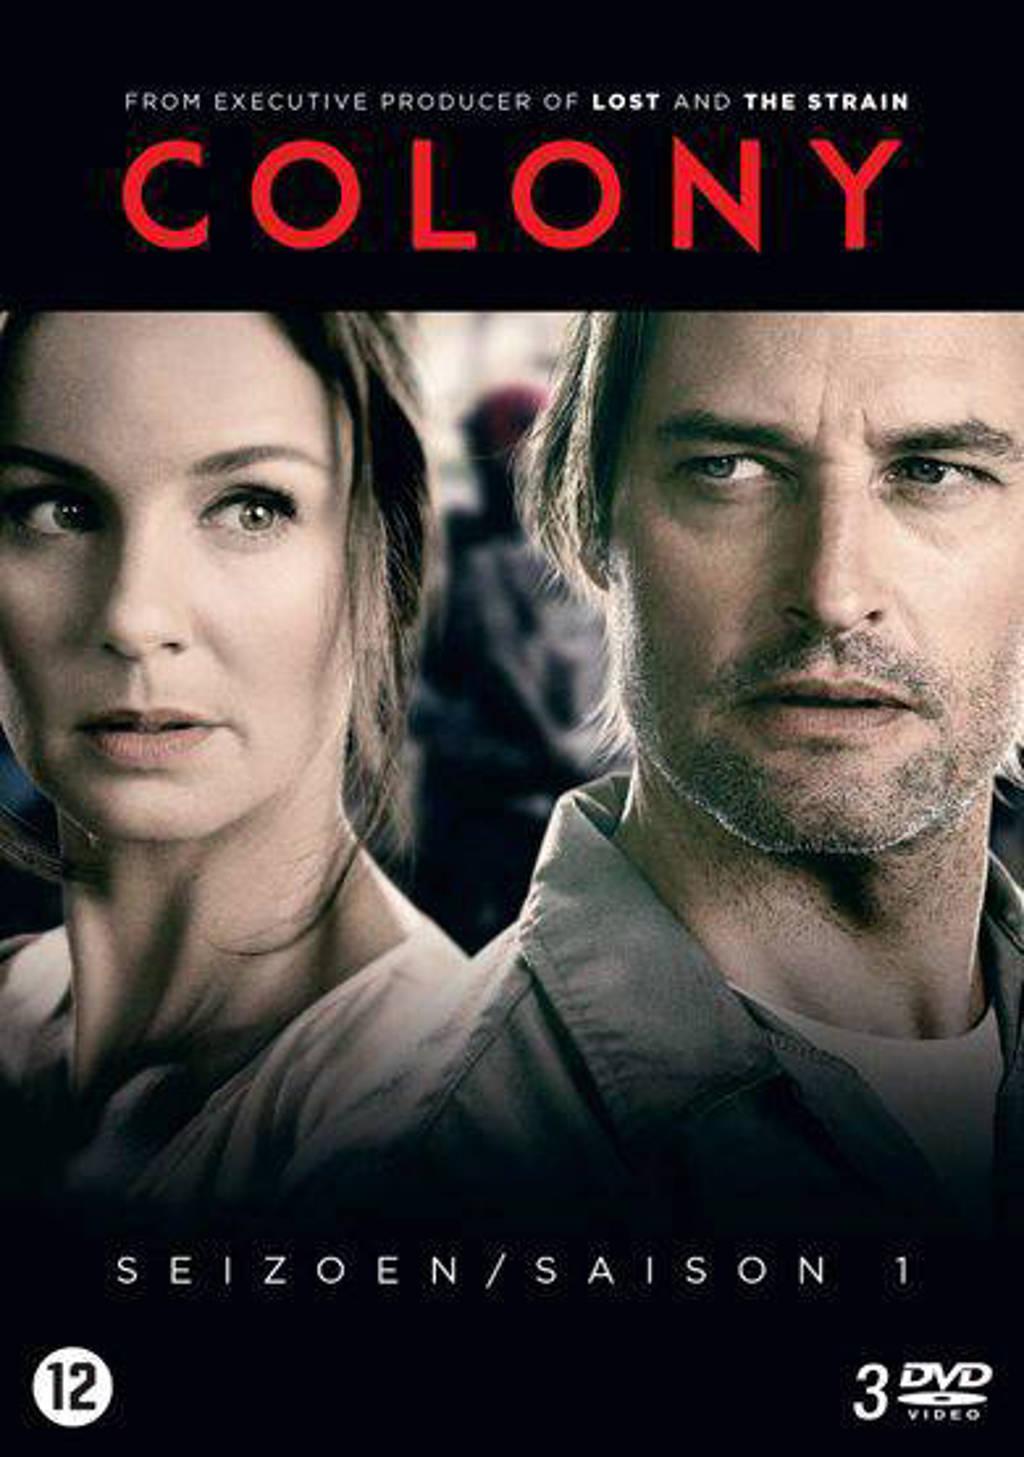 Colony - Seizoen 1 (DVD)